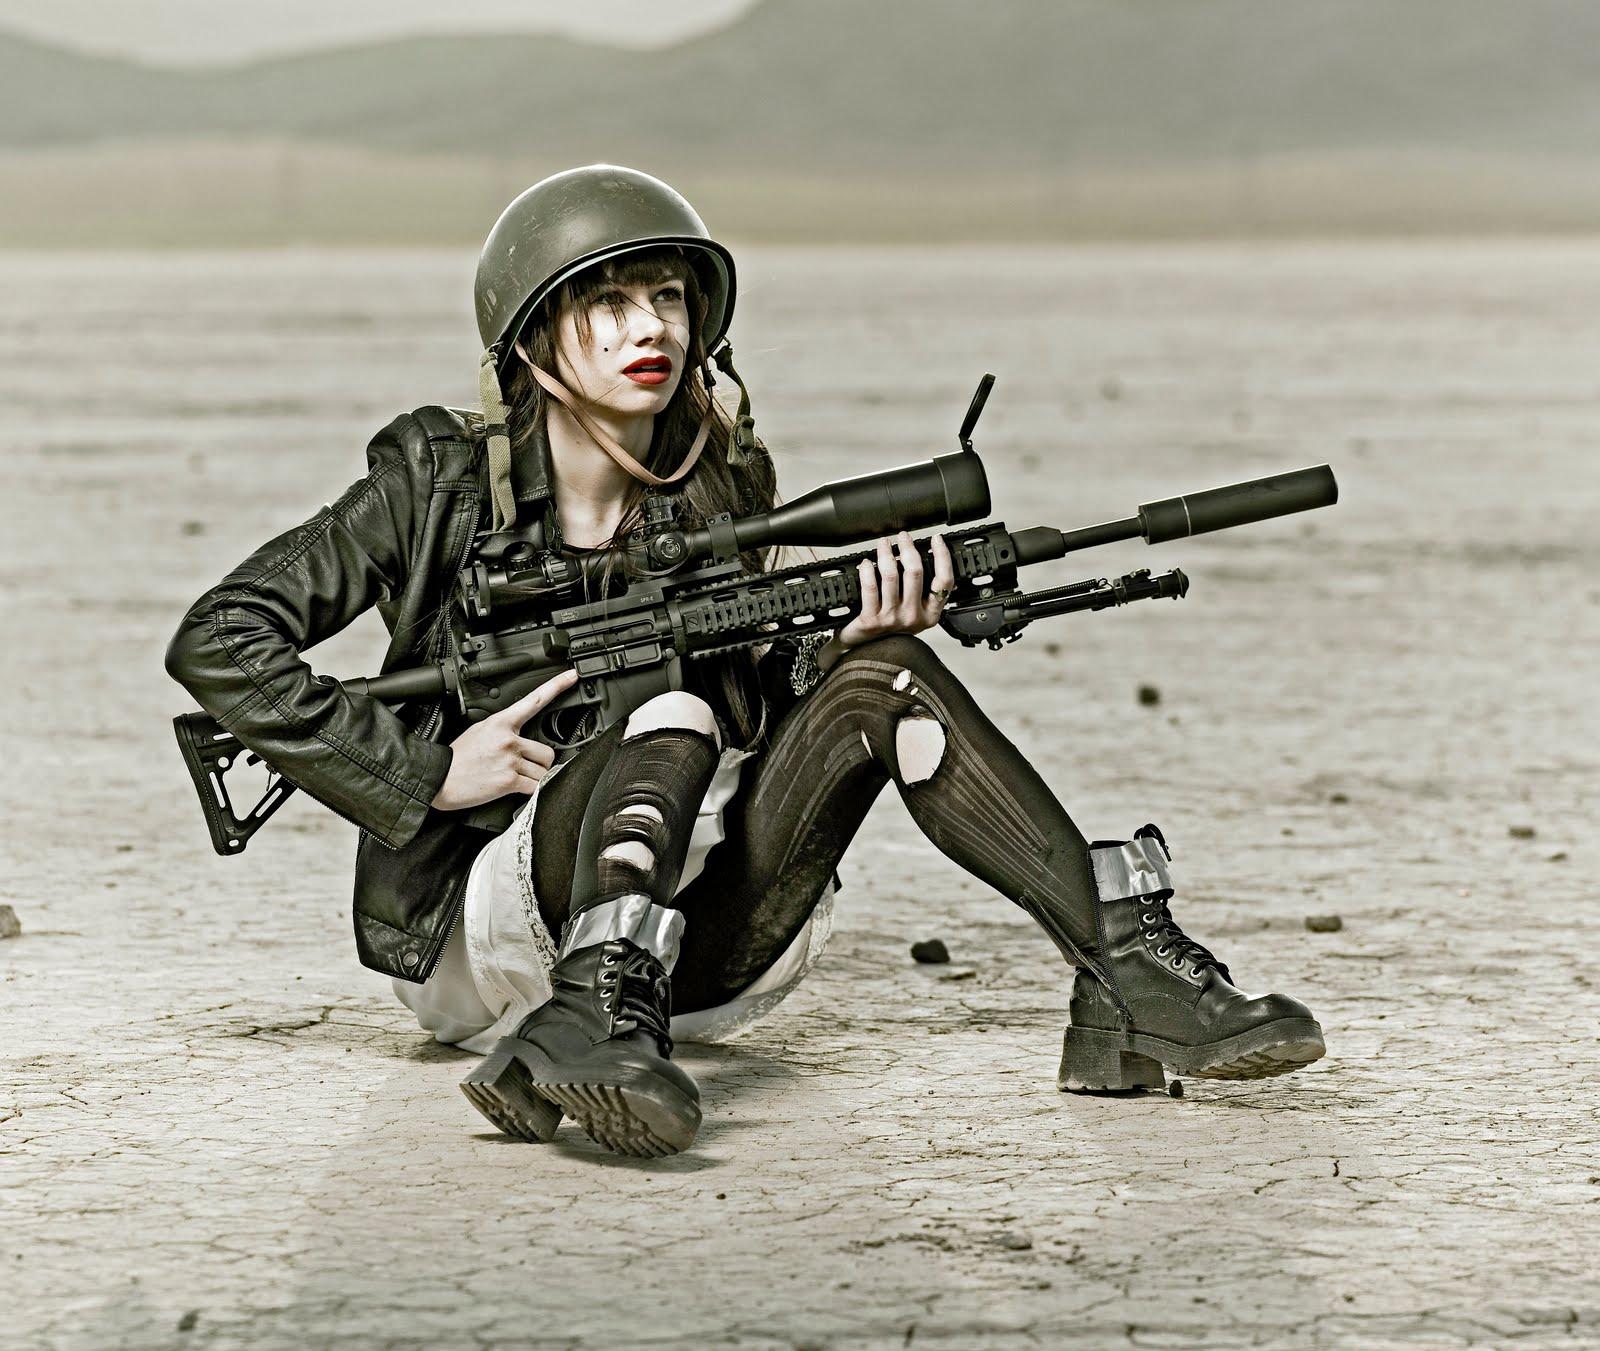 Apocalyptic Soldier Pics: Sampsel Preston Photography: Post Apocalyptic Fashion: A